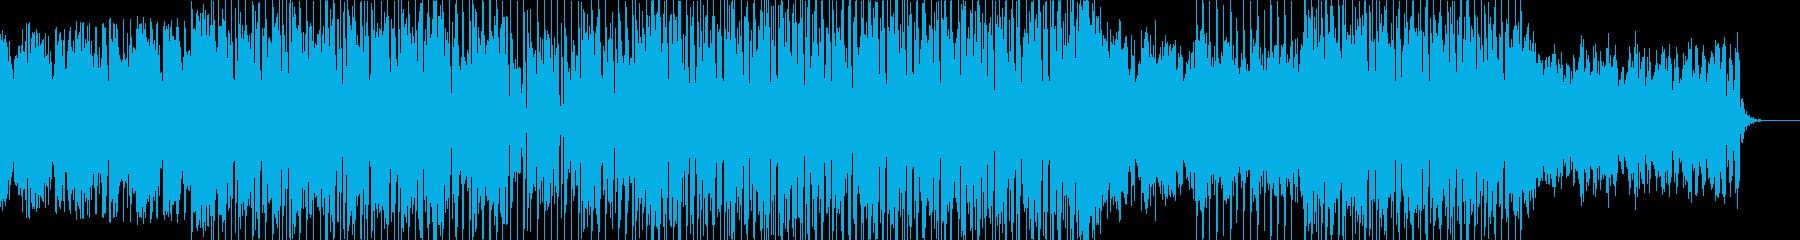 Lo-fi Technoの再生済みの波形